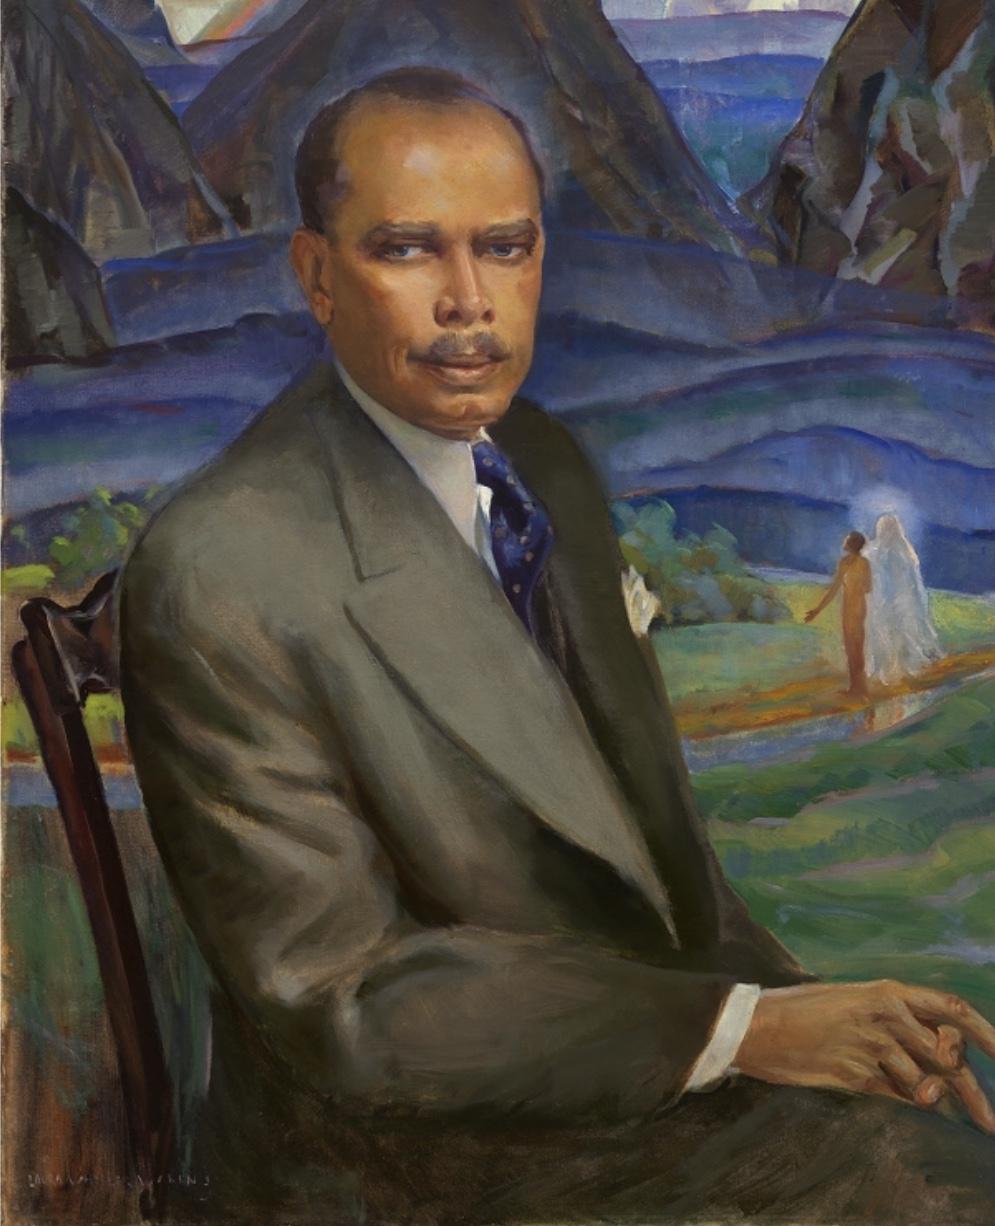 James Weldon Johnson. National Portrait Gallery